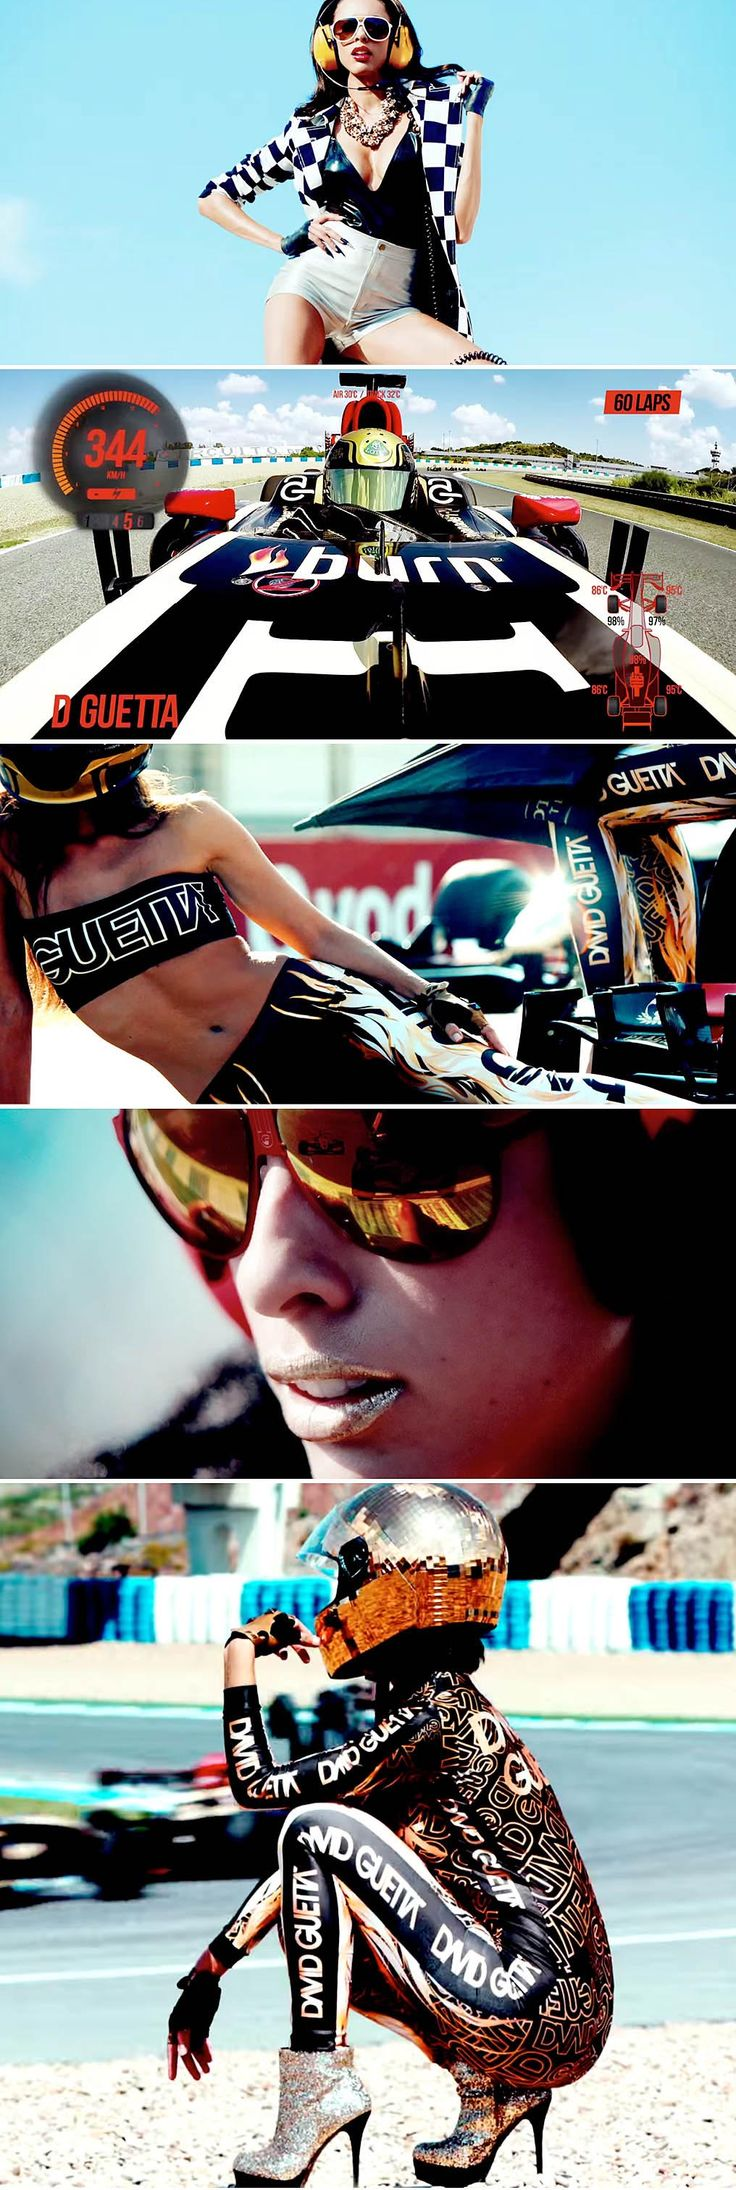 A bit of eye candy from #DavidGuetta's dramatic track showdown with #F1 driver, Romain Grosjean #Dangerous: http://www.creation.com.es/david-guetta-dangerous-ft-sam-martin/